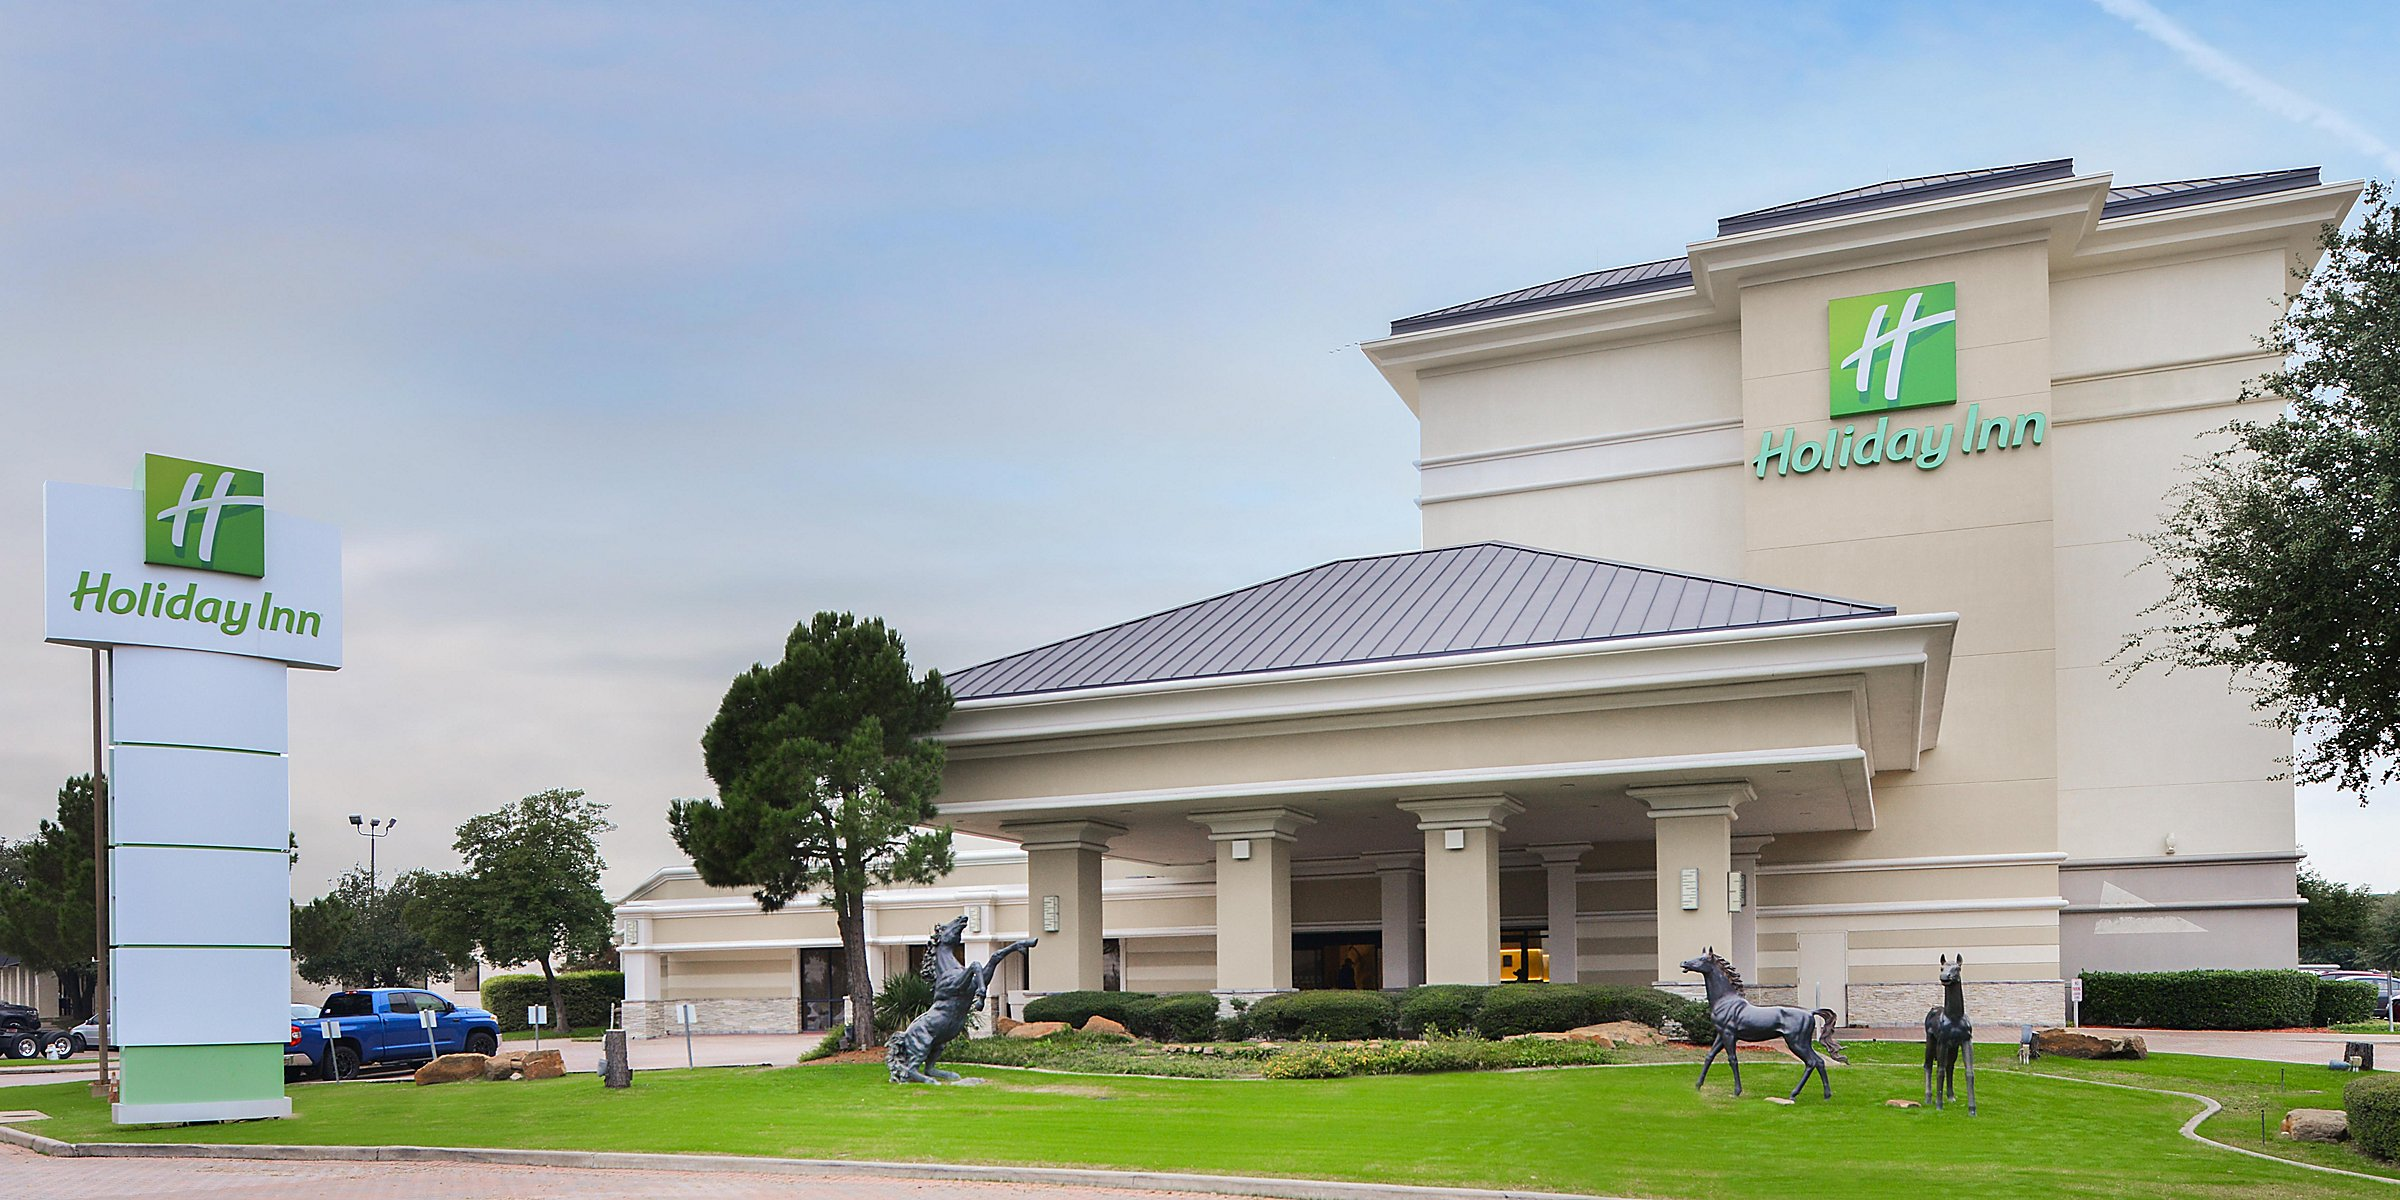 Hotels in Richardson, TX | Holiday Inn Dallas-Richardson